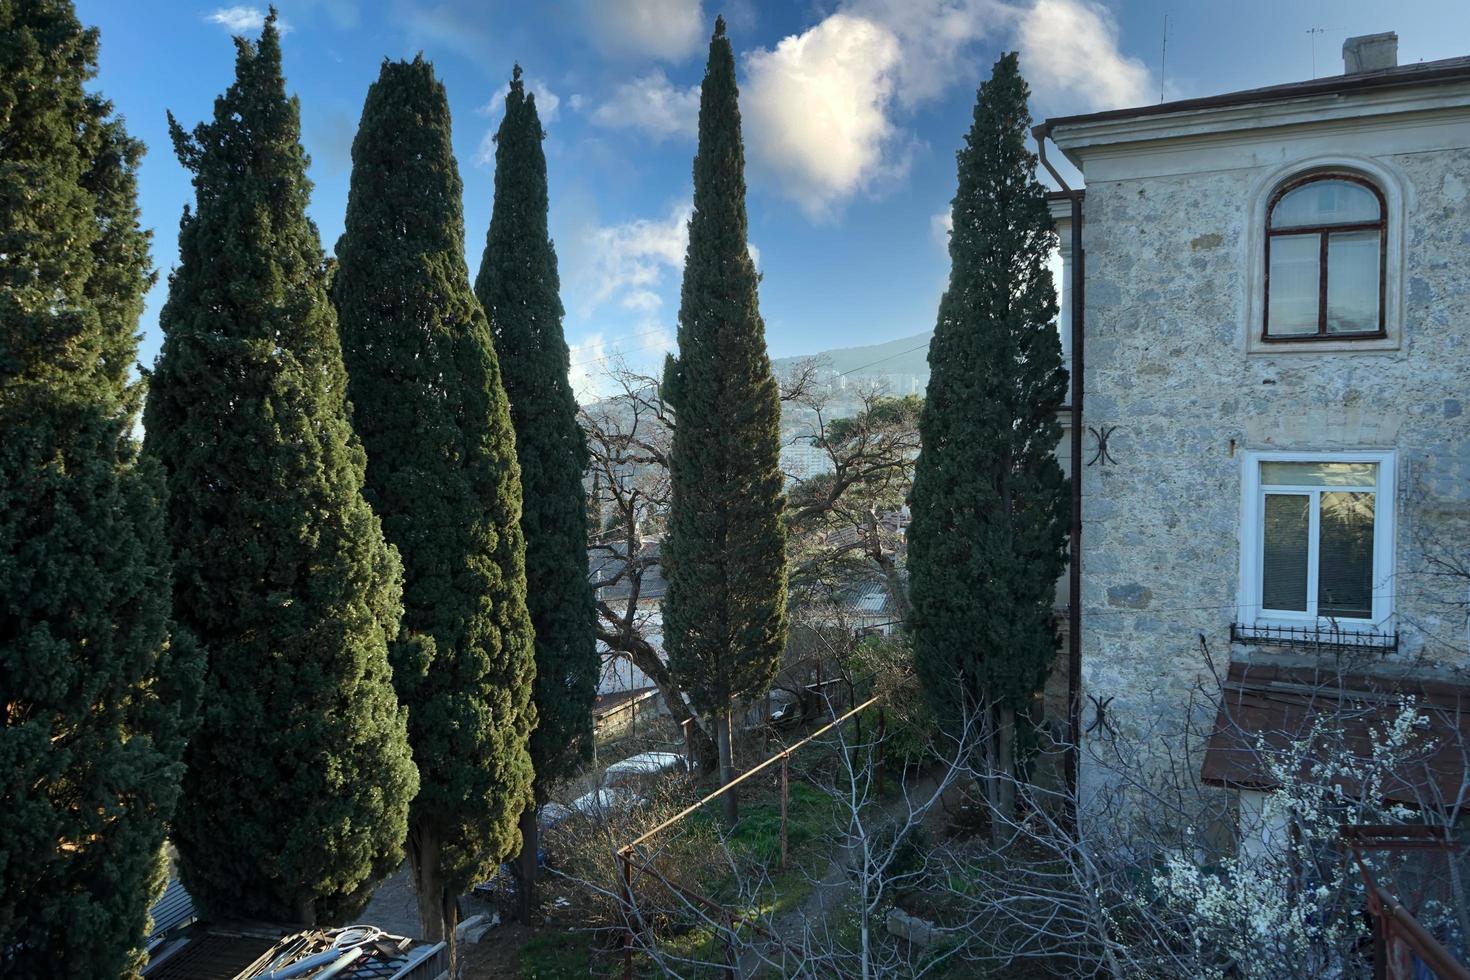 yalta, krim. stadslandskap foto